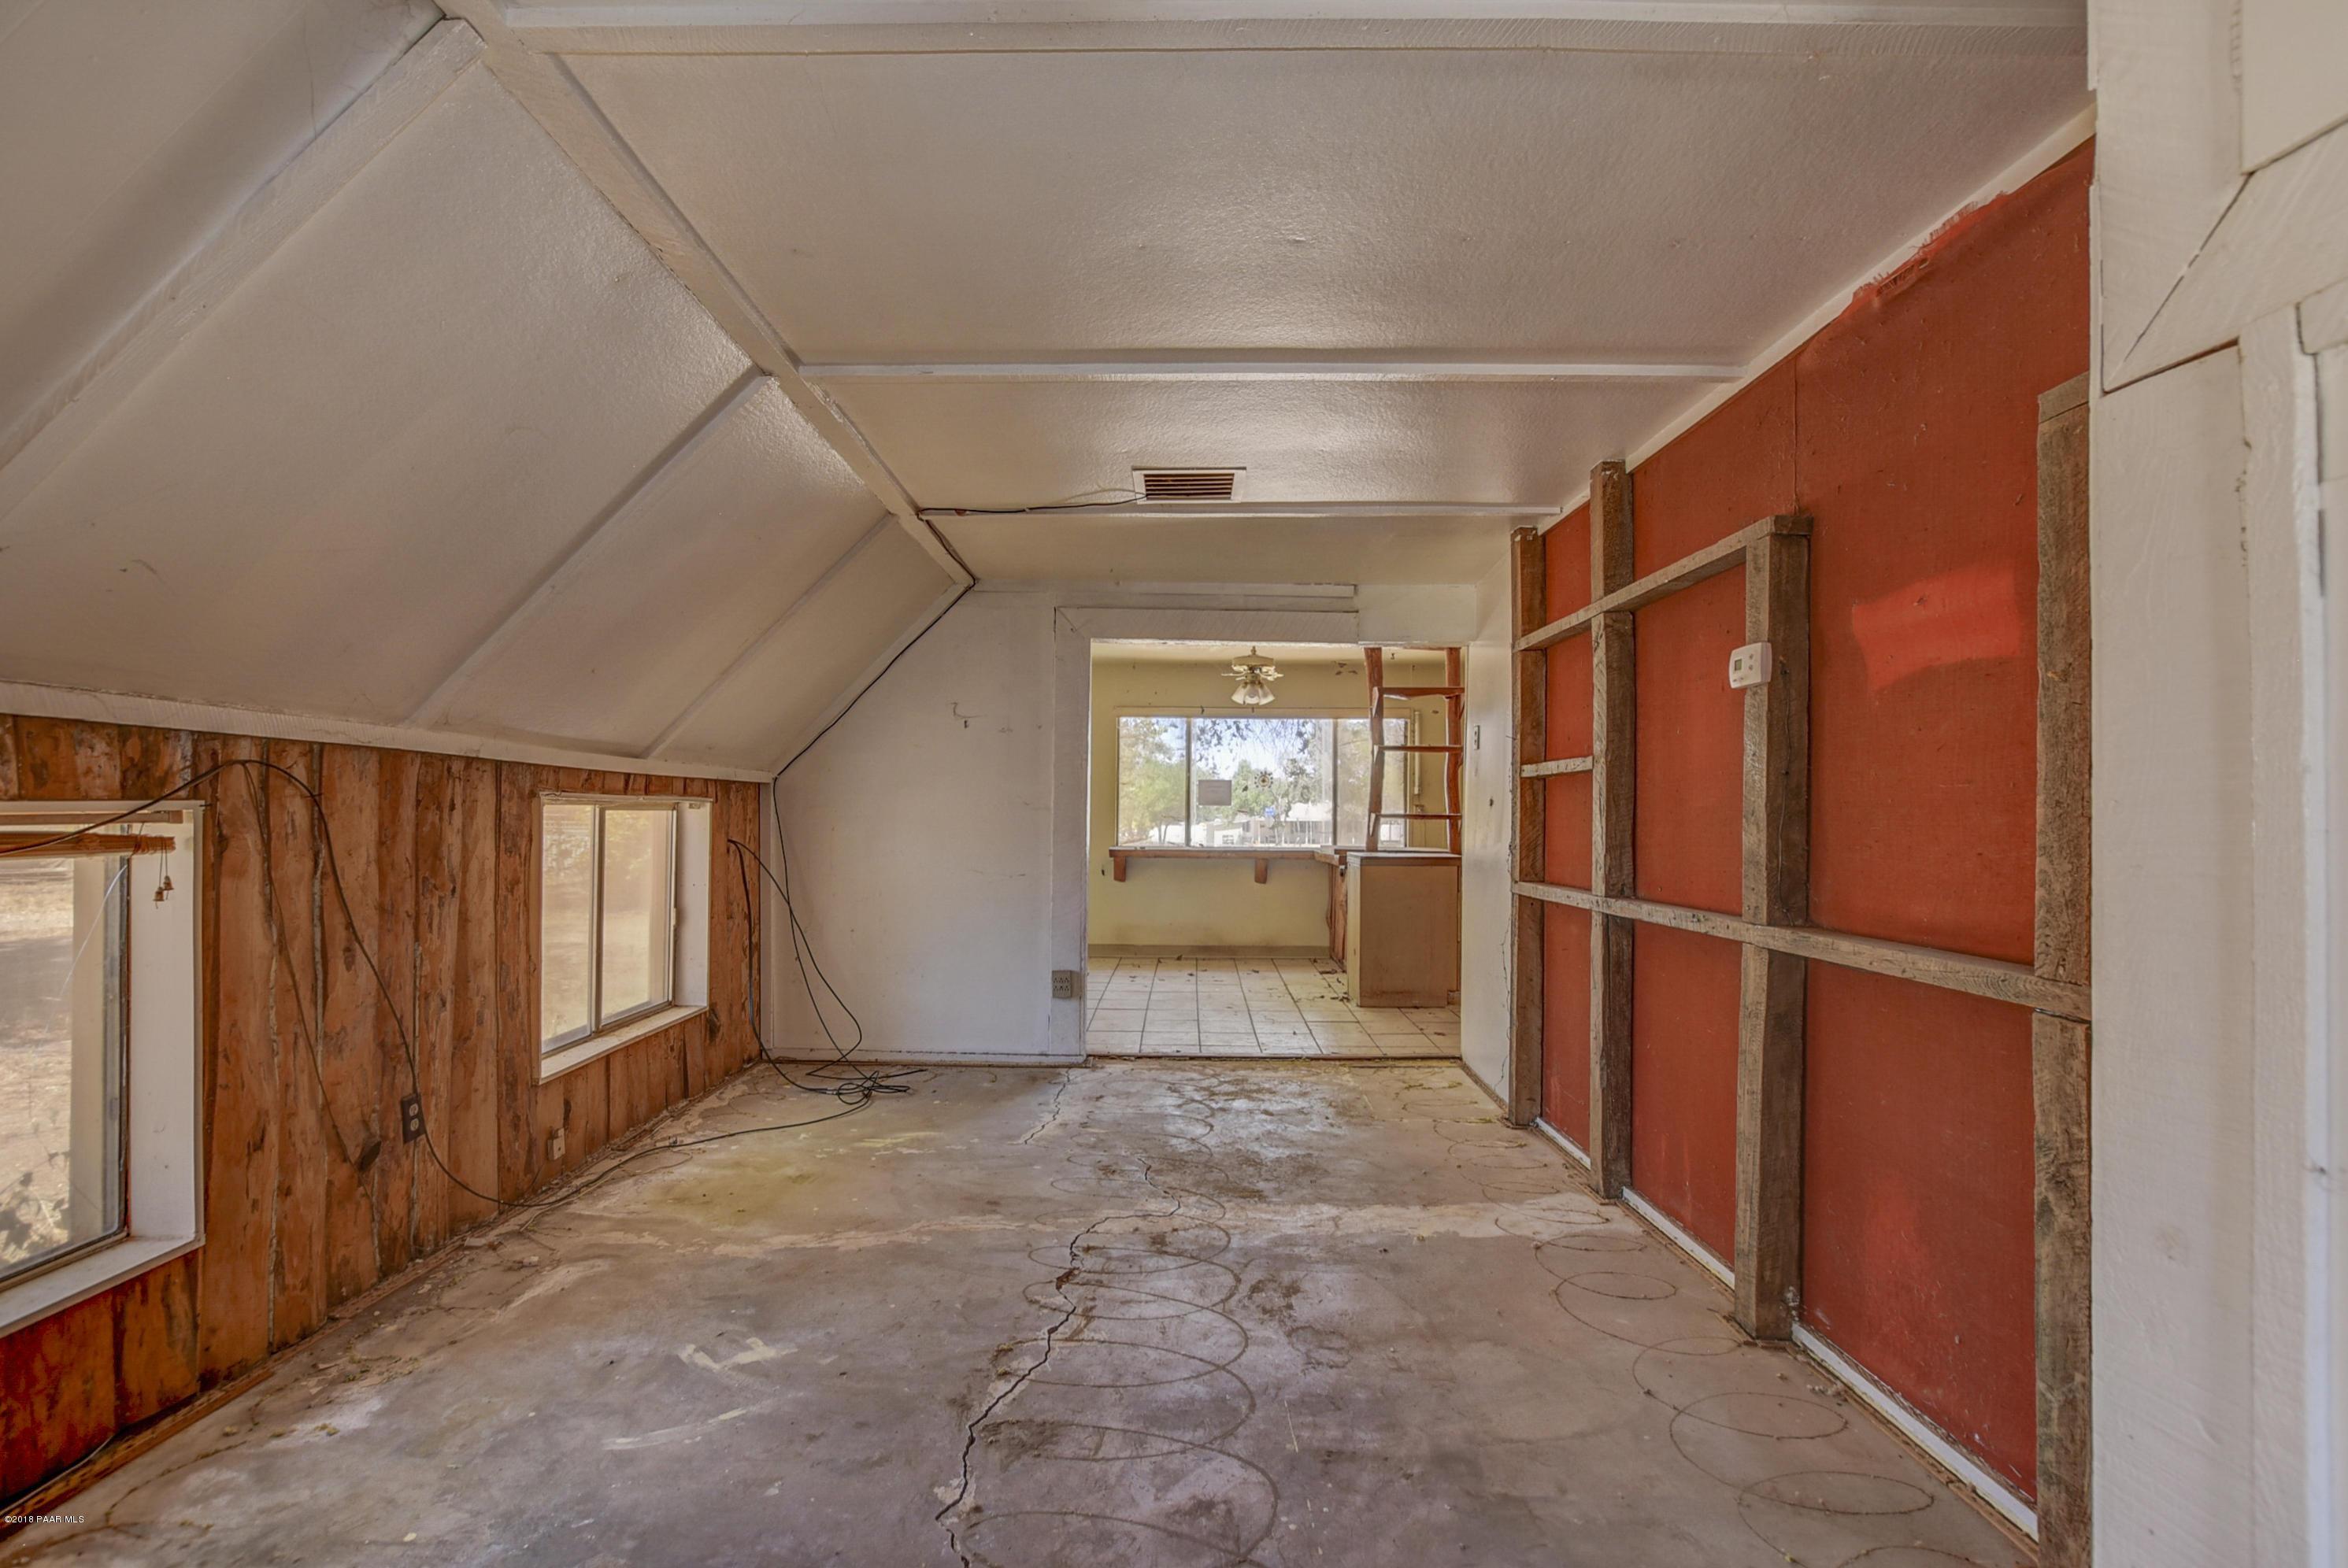 420 Karen Drive Chino Valley, AZ 86323 - MLS #: 1013703